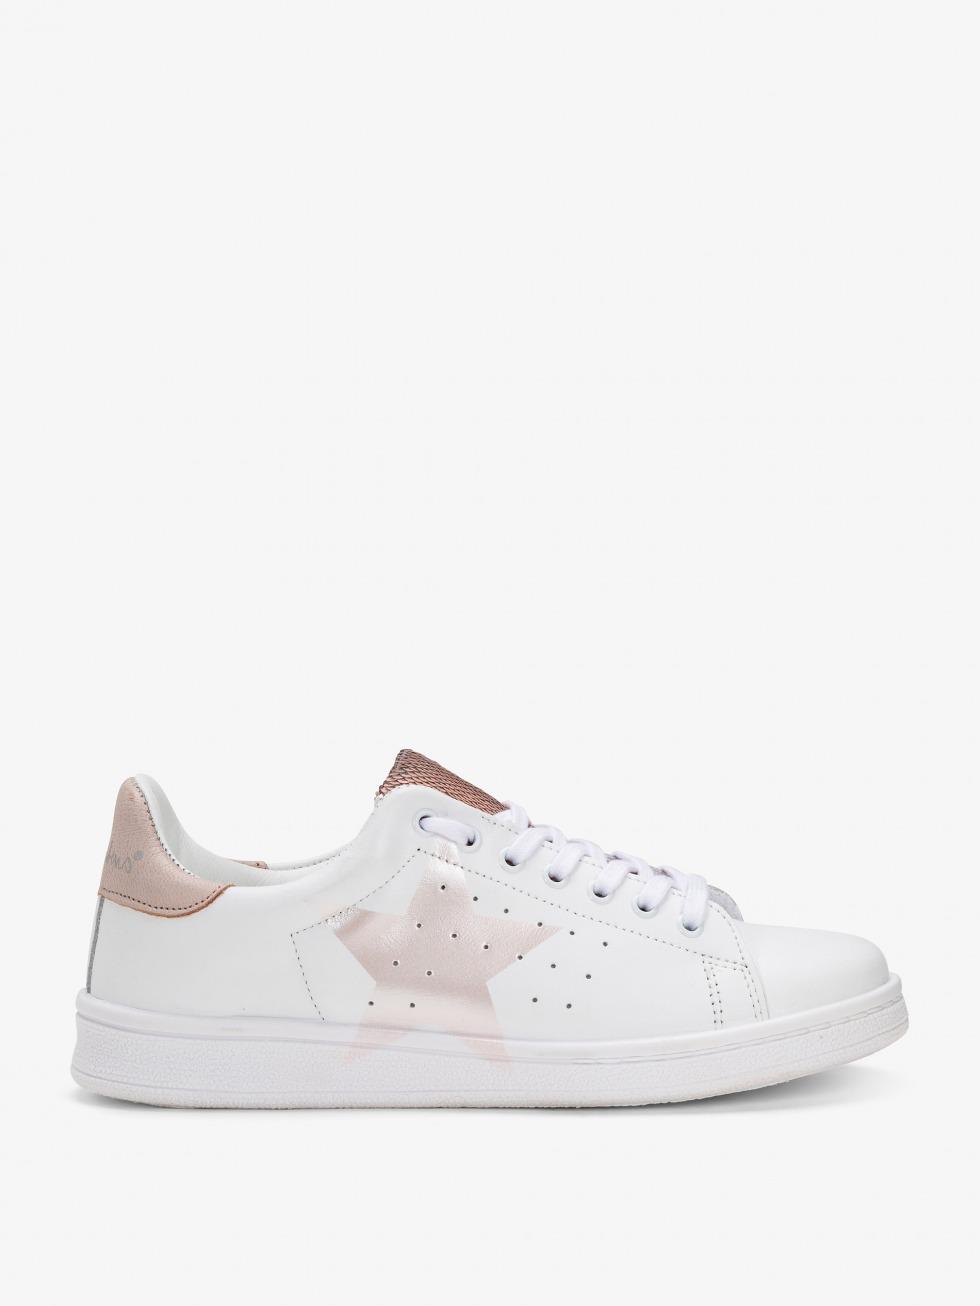 Daiquiri Sneakers - Sparkle Taffy Star